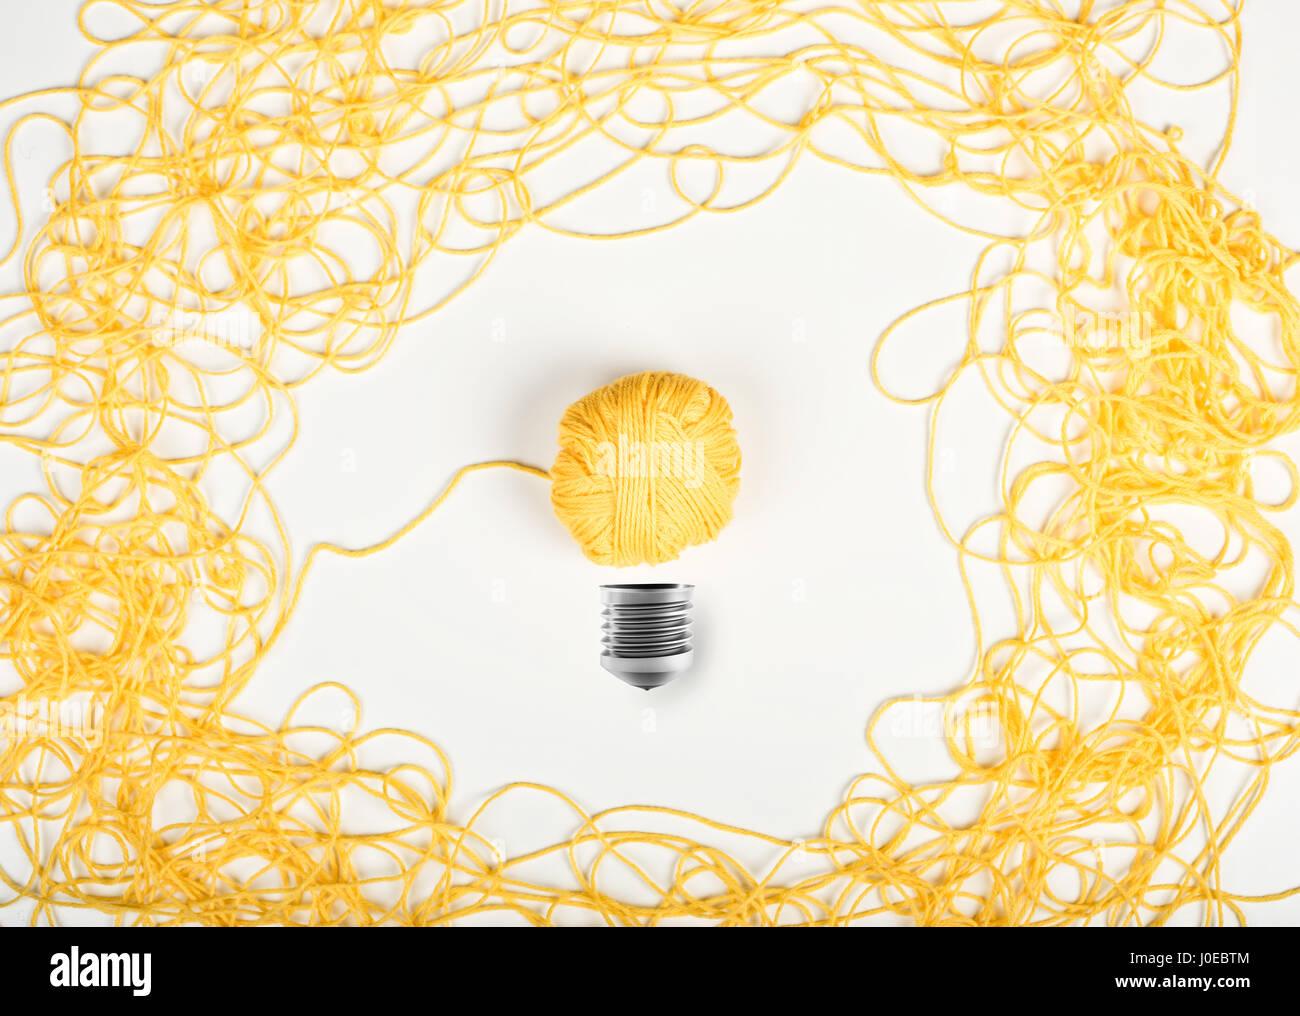 Konzept, Idee und Innovation mit Wolle ball Stockbild